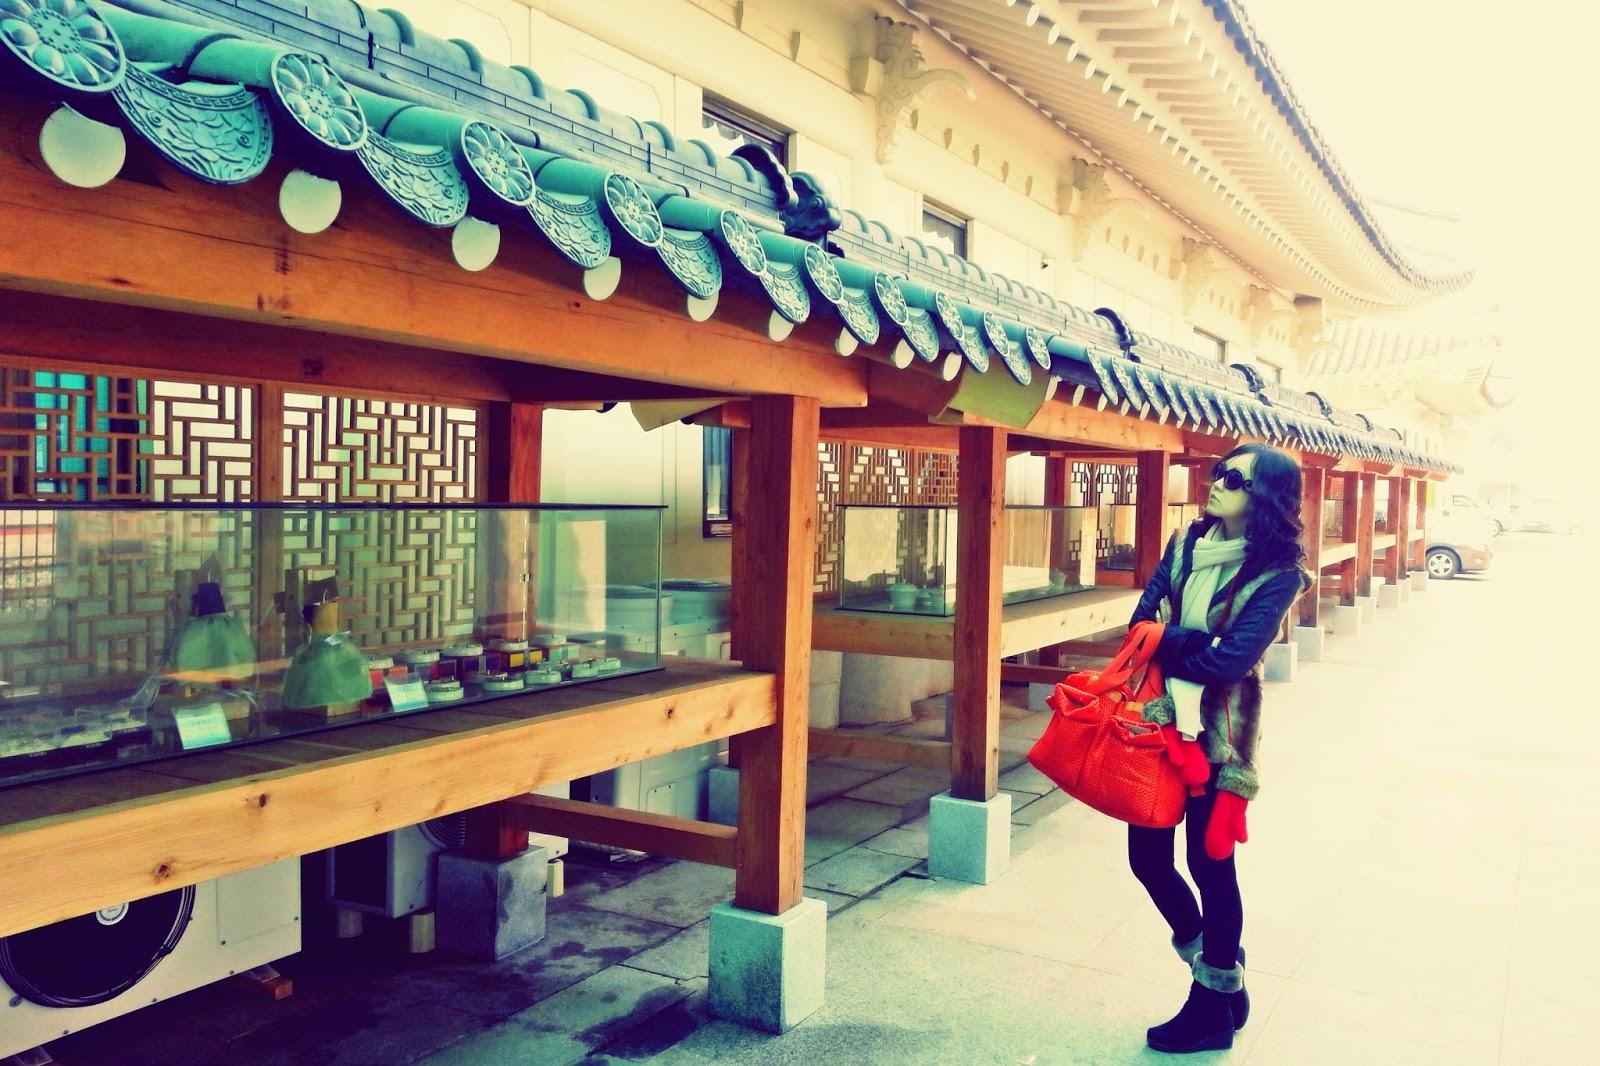 Jeonju Hanok Village Hotel 전주한옥빌리지호텔 | meheartseoul.blogspot.com